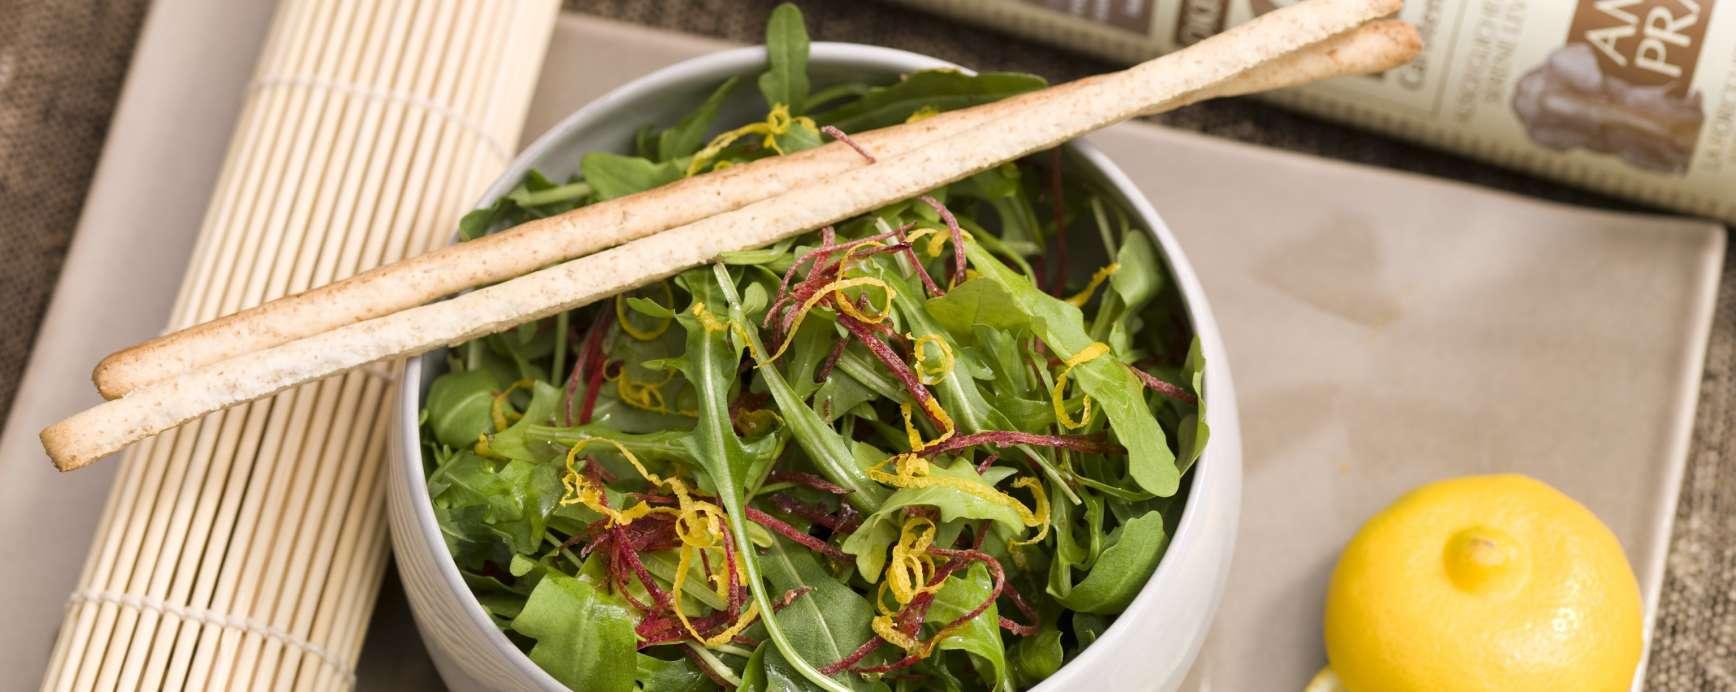 Mesclun salade met bergamot